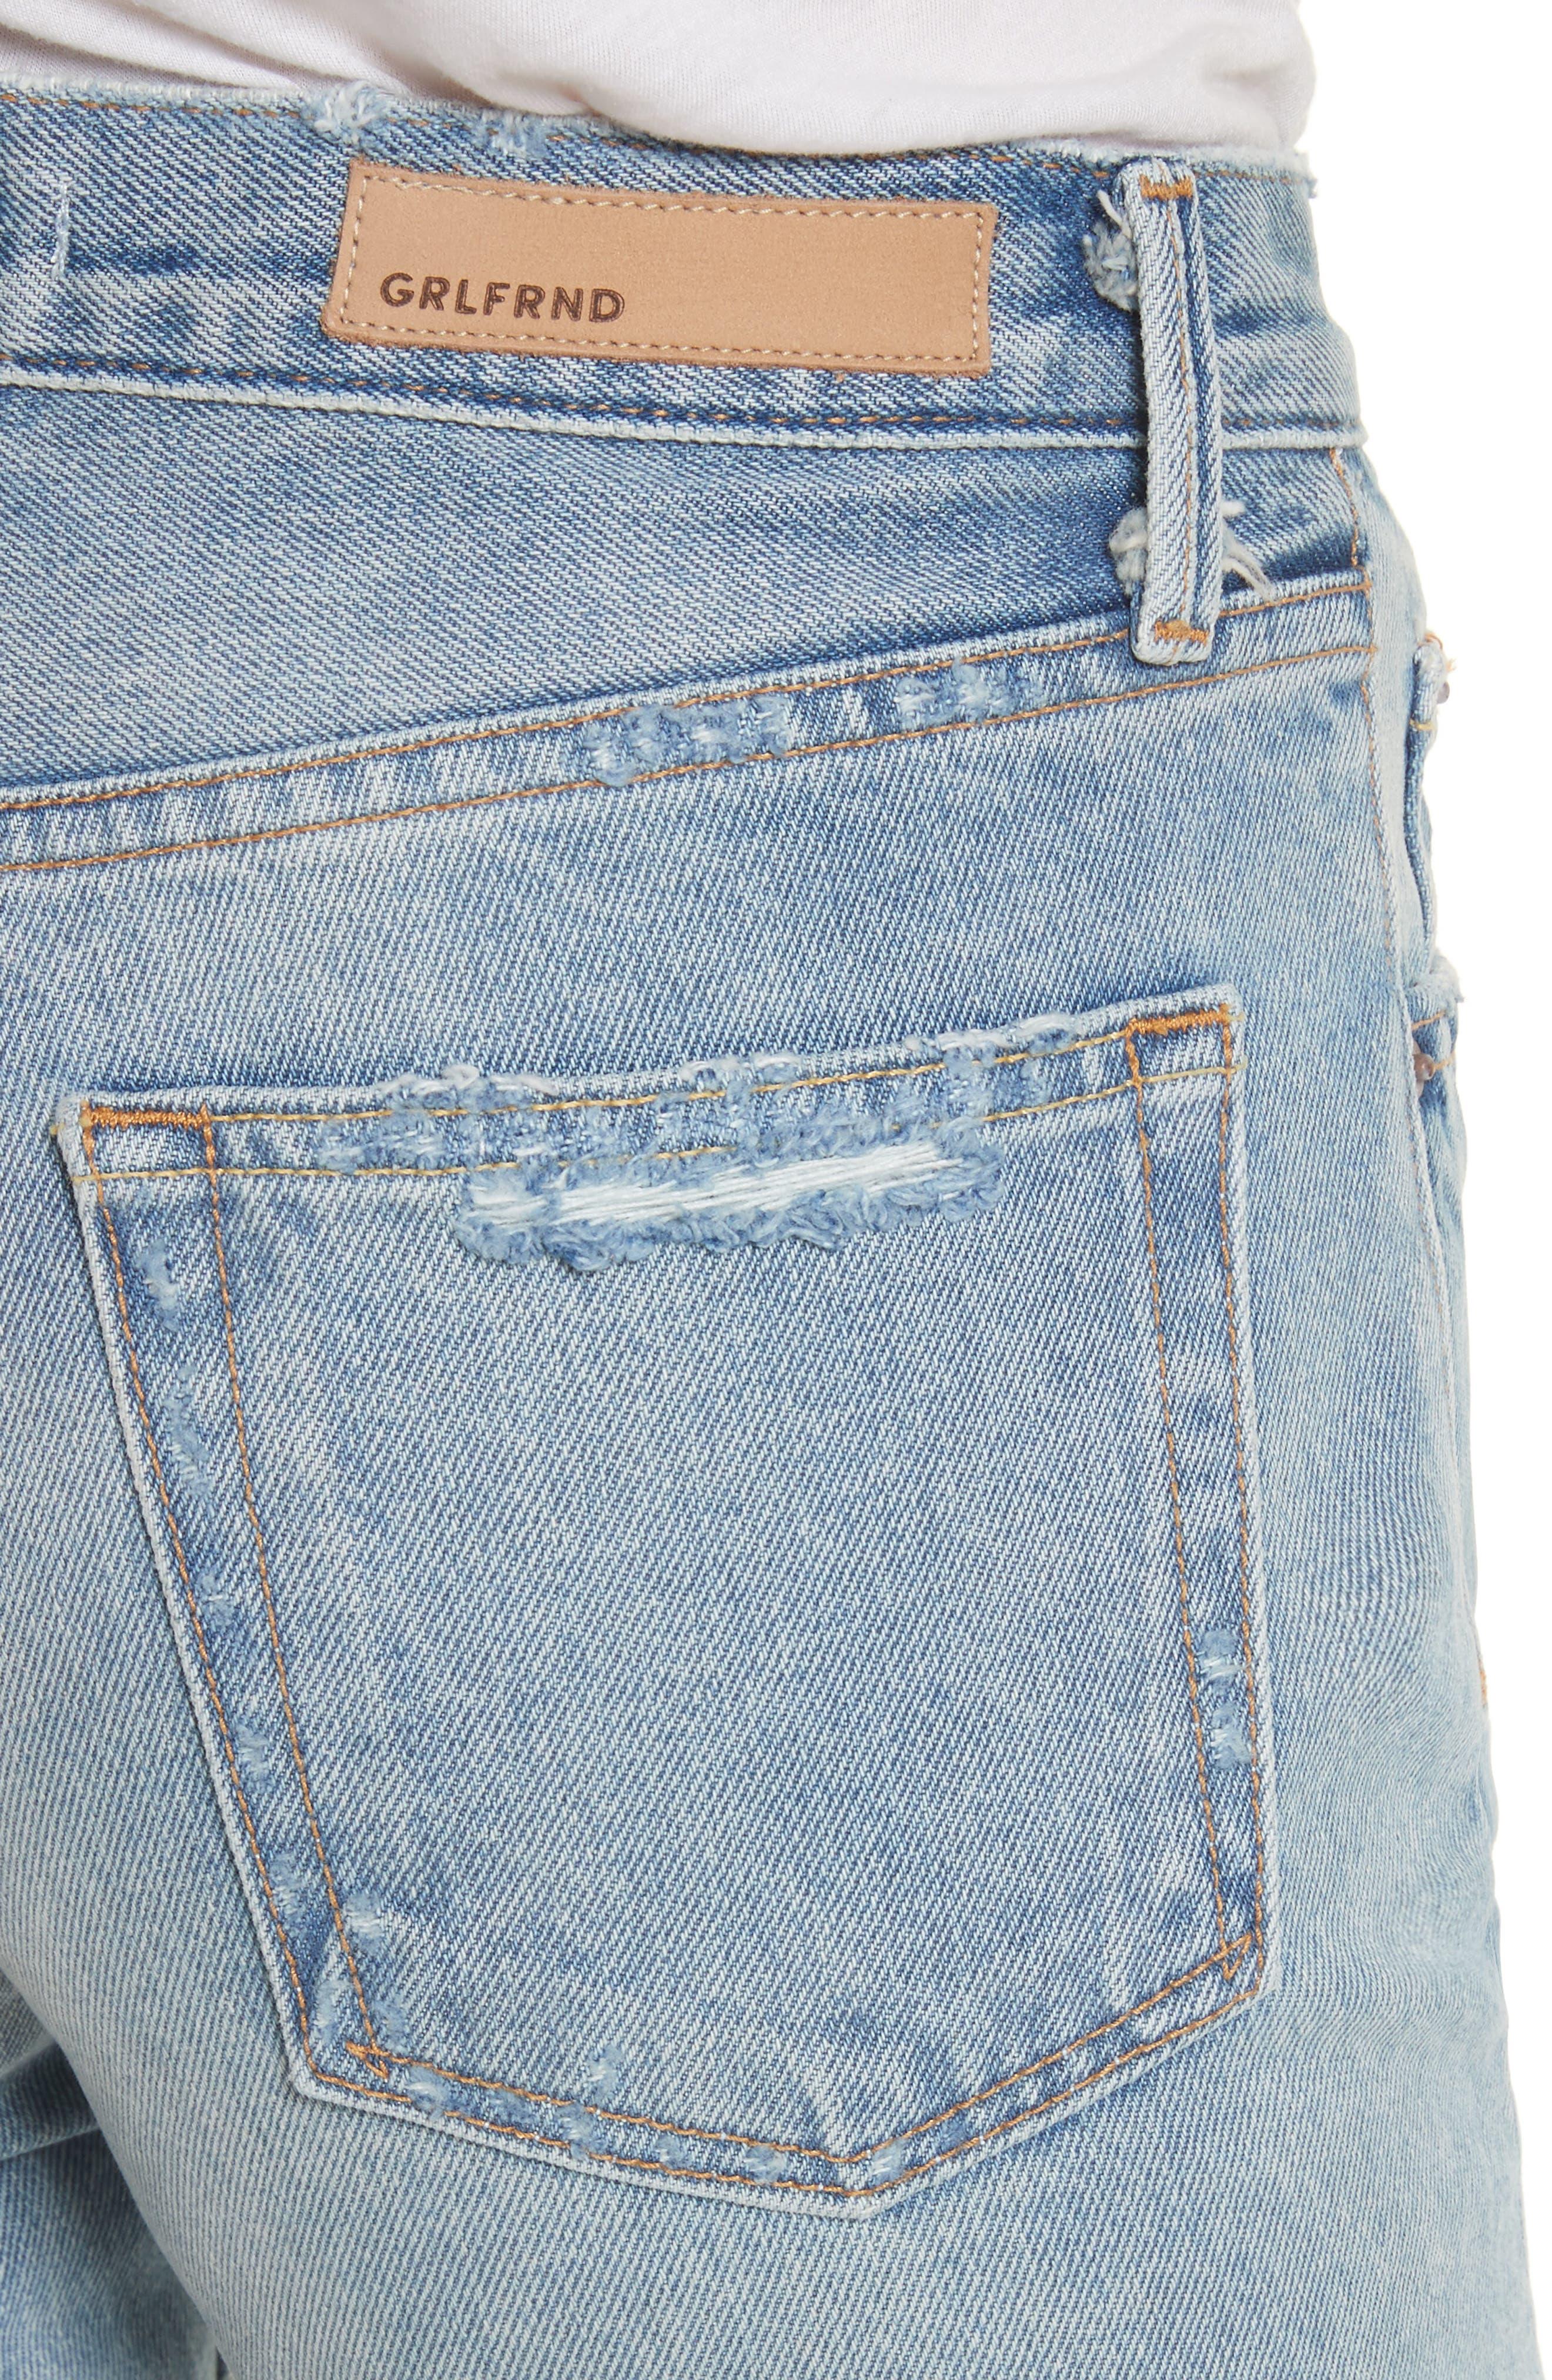 Alternate Image 4  - GRLFRND Helena Ripped Rigid High Waist Straight Jeans (Reese)